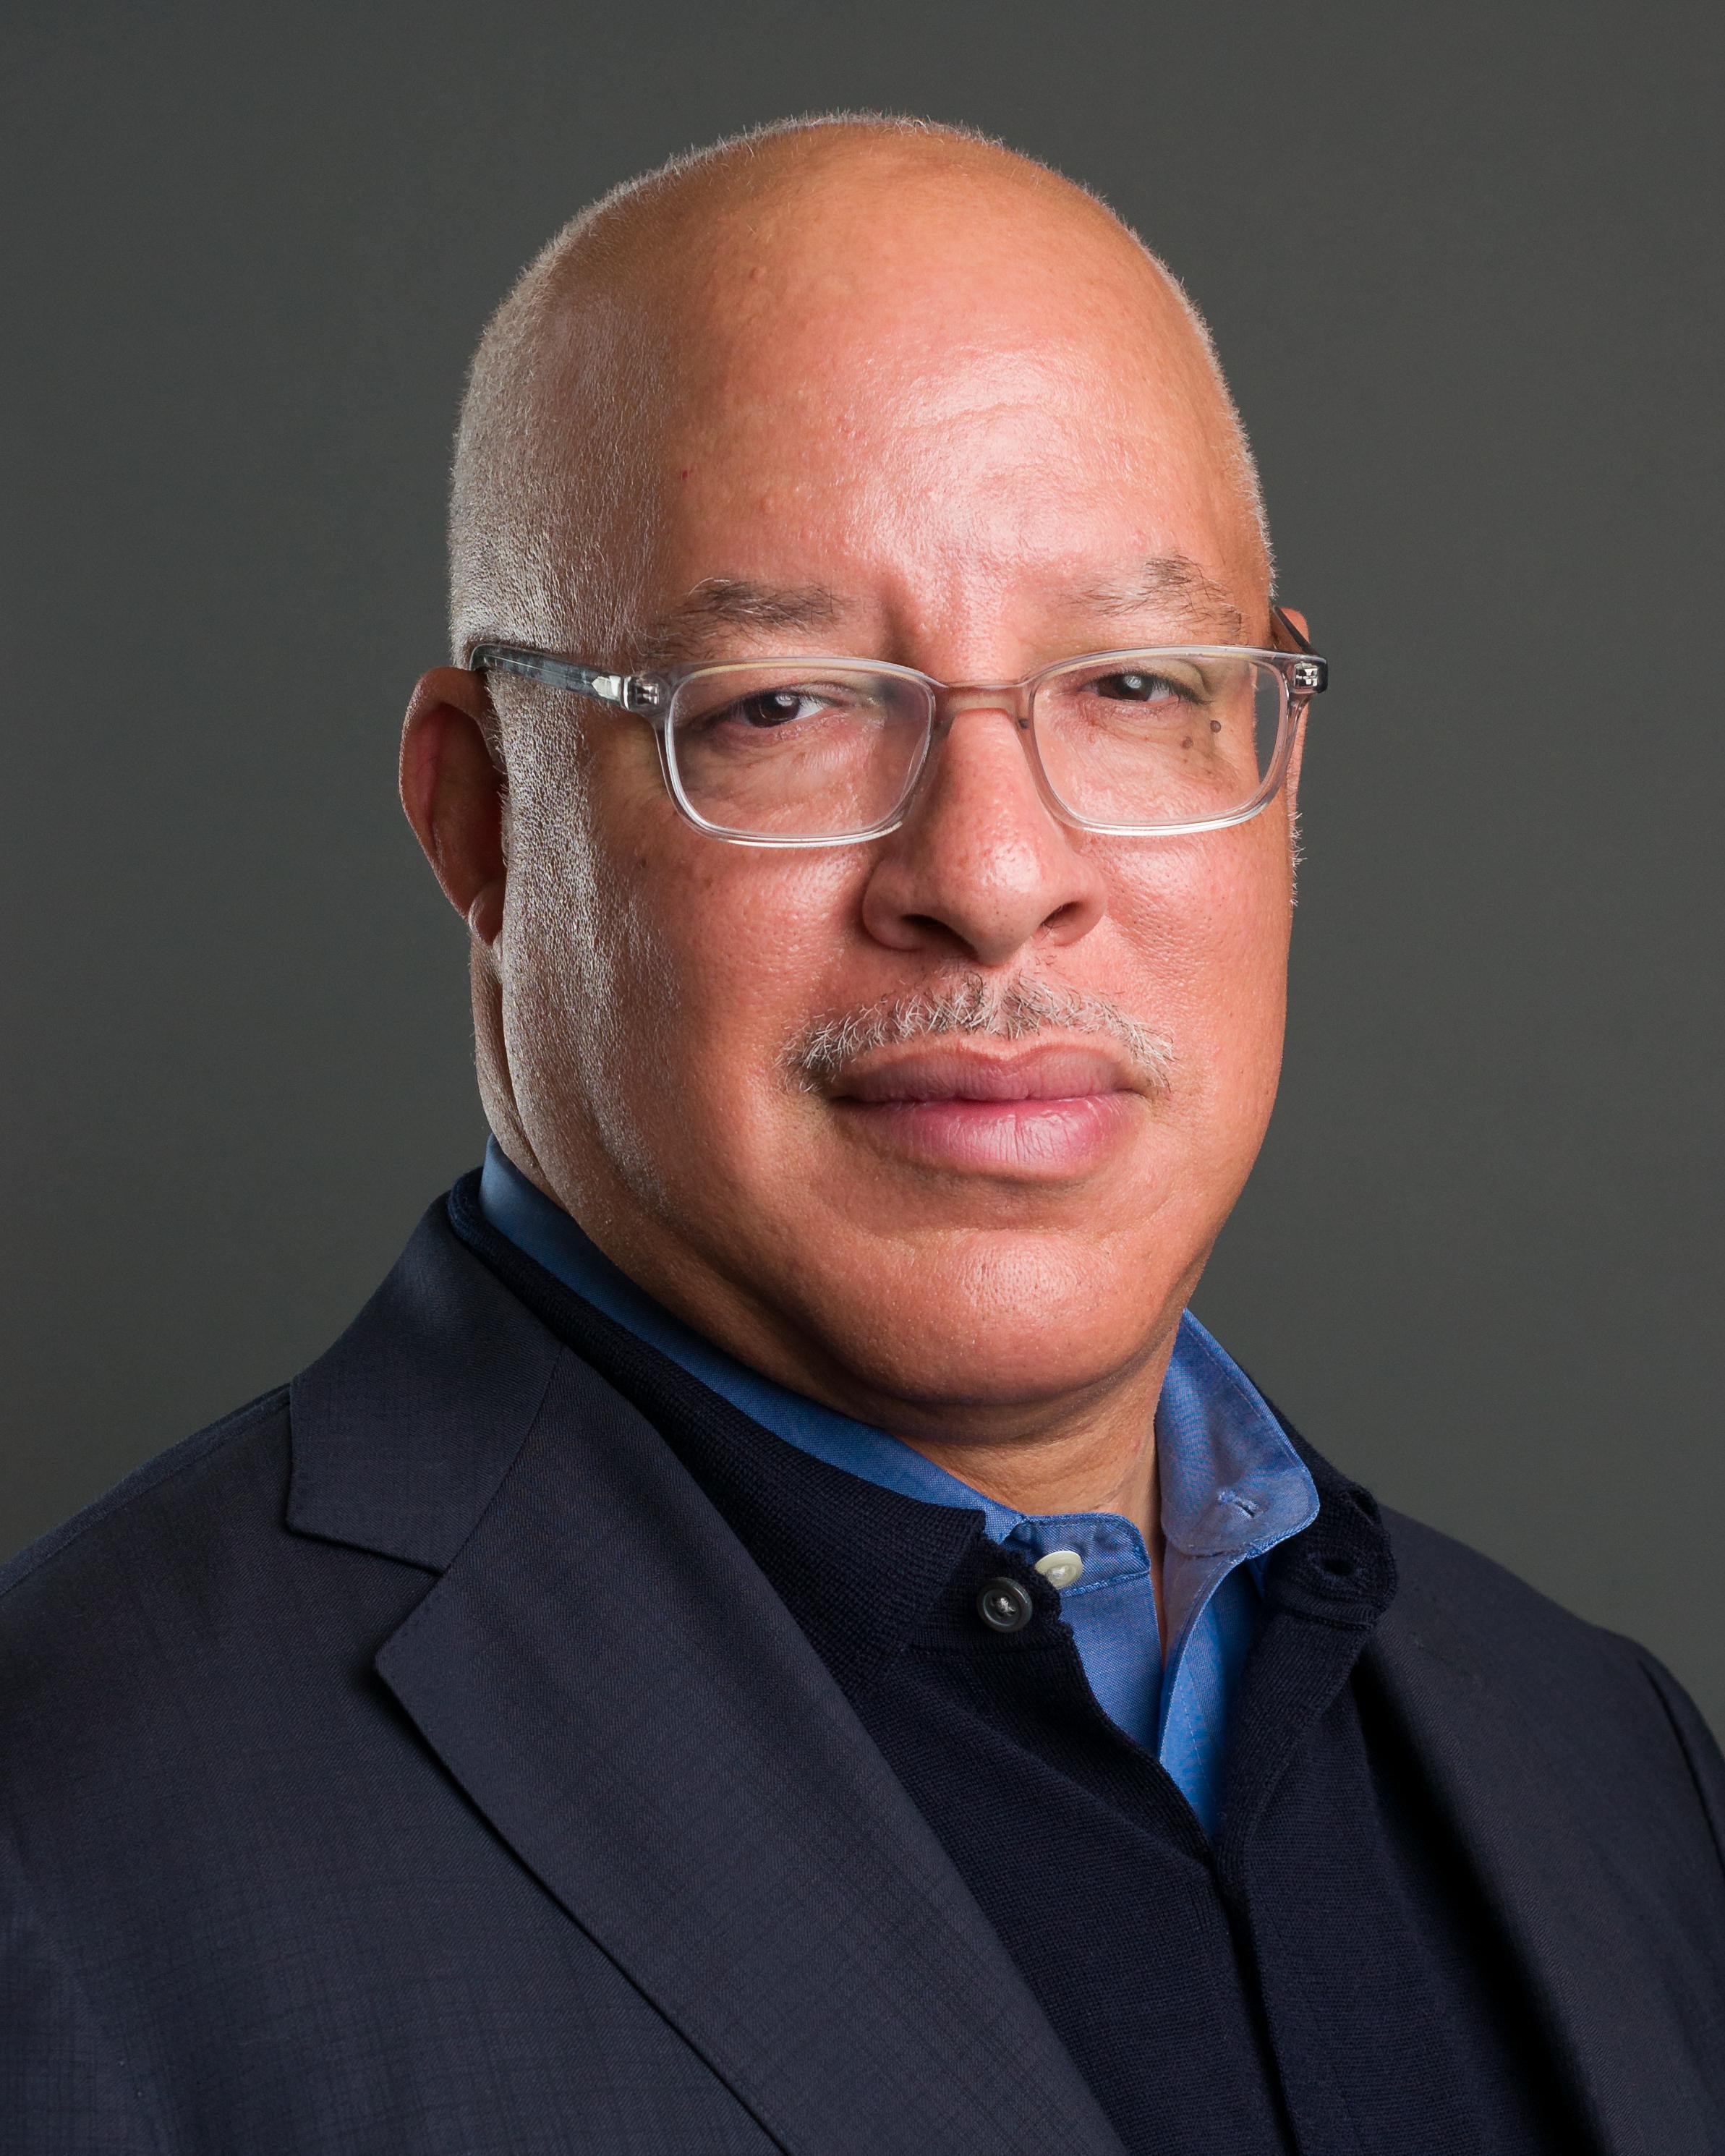 Dr. Eric E. Whitaker